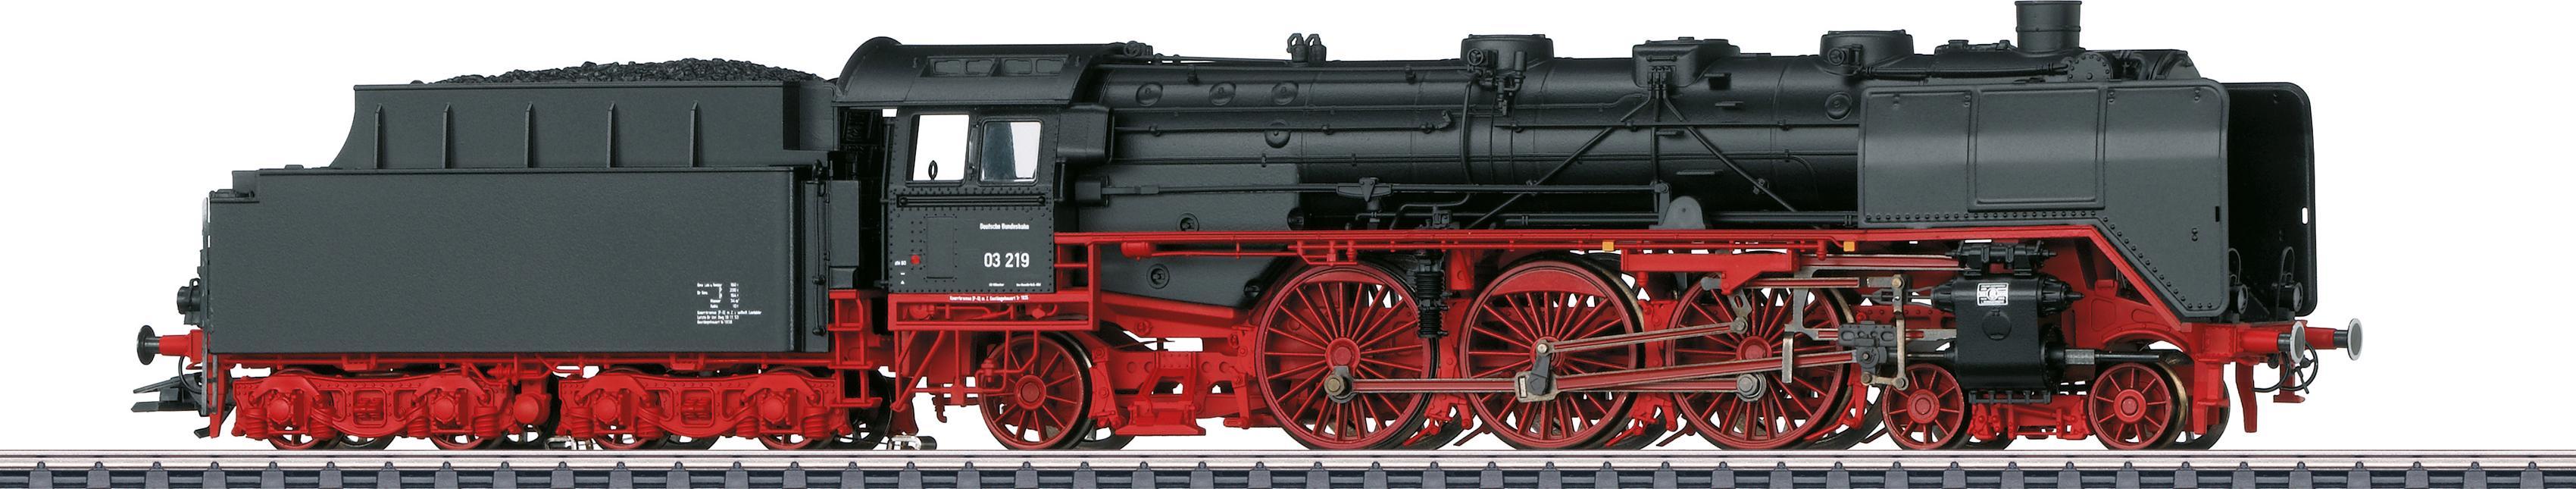 Märklin Personenzug-Dampflokomotive BR 03 219 Altbau DB - 37949, Spur H0